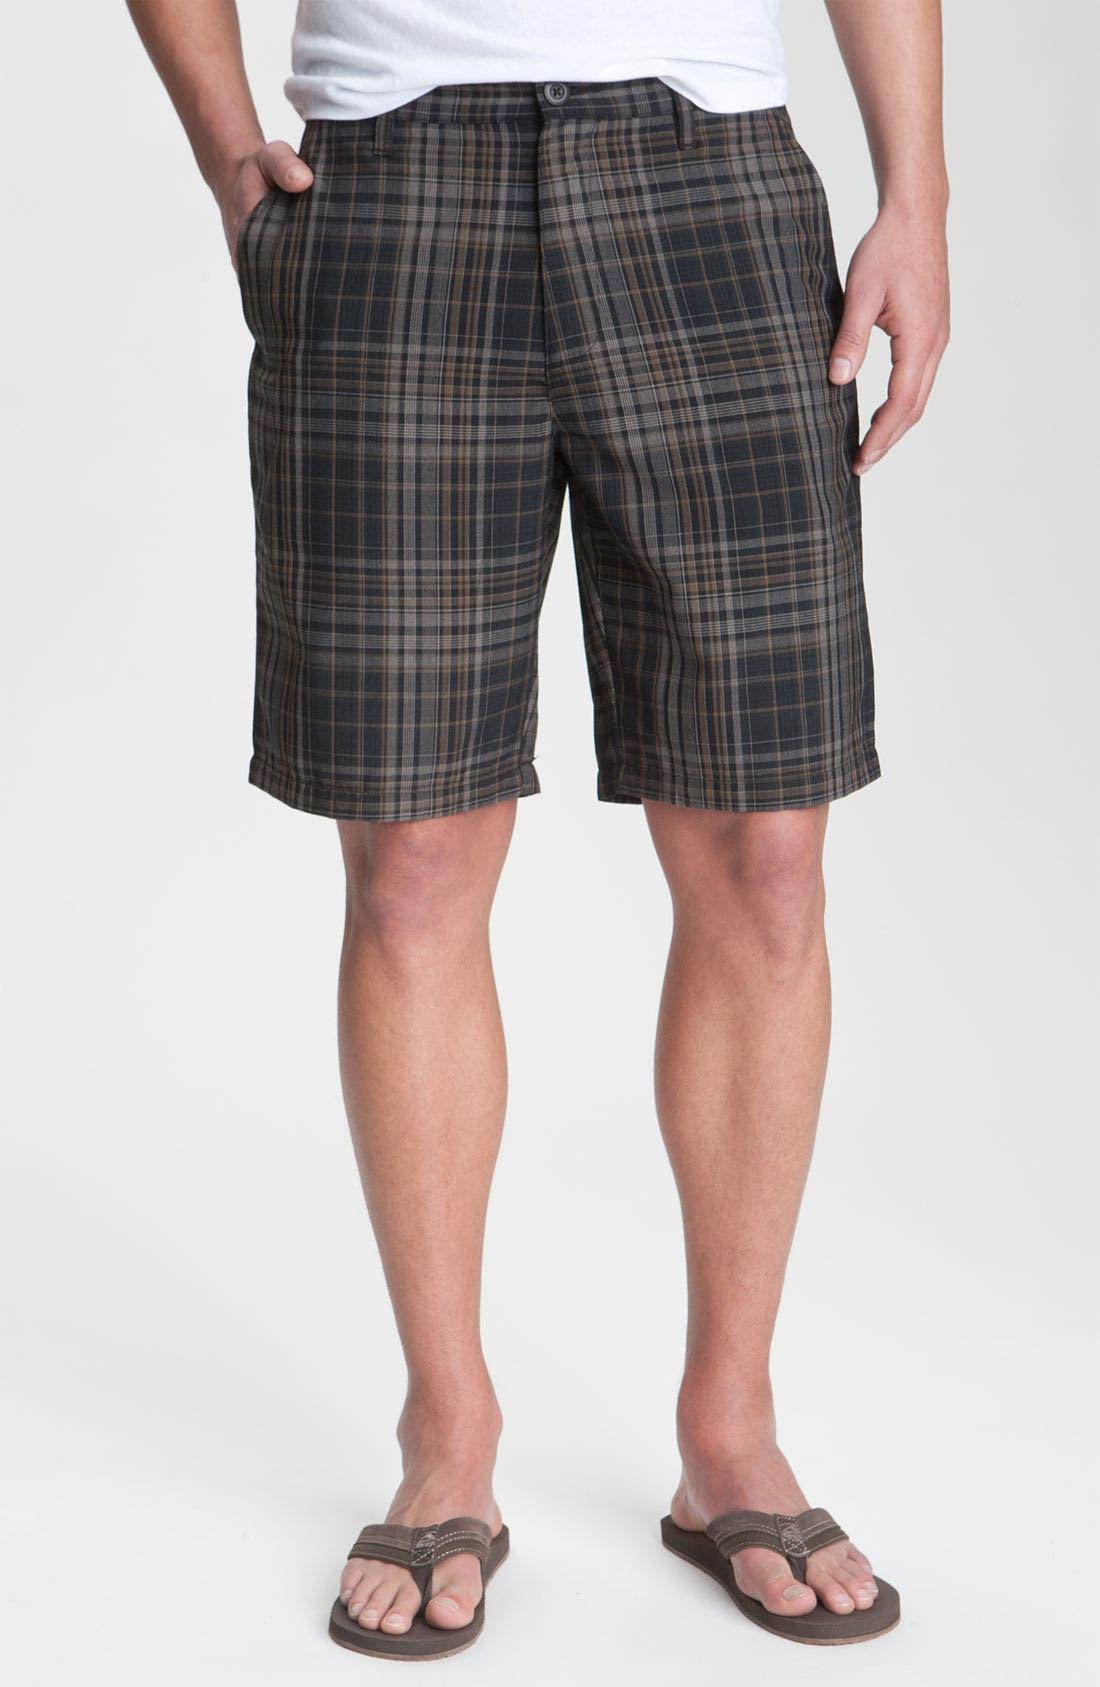 Alternate Image 1 Selected - RVCA 'Delta' Plaid Shorts